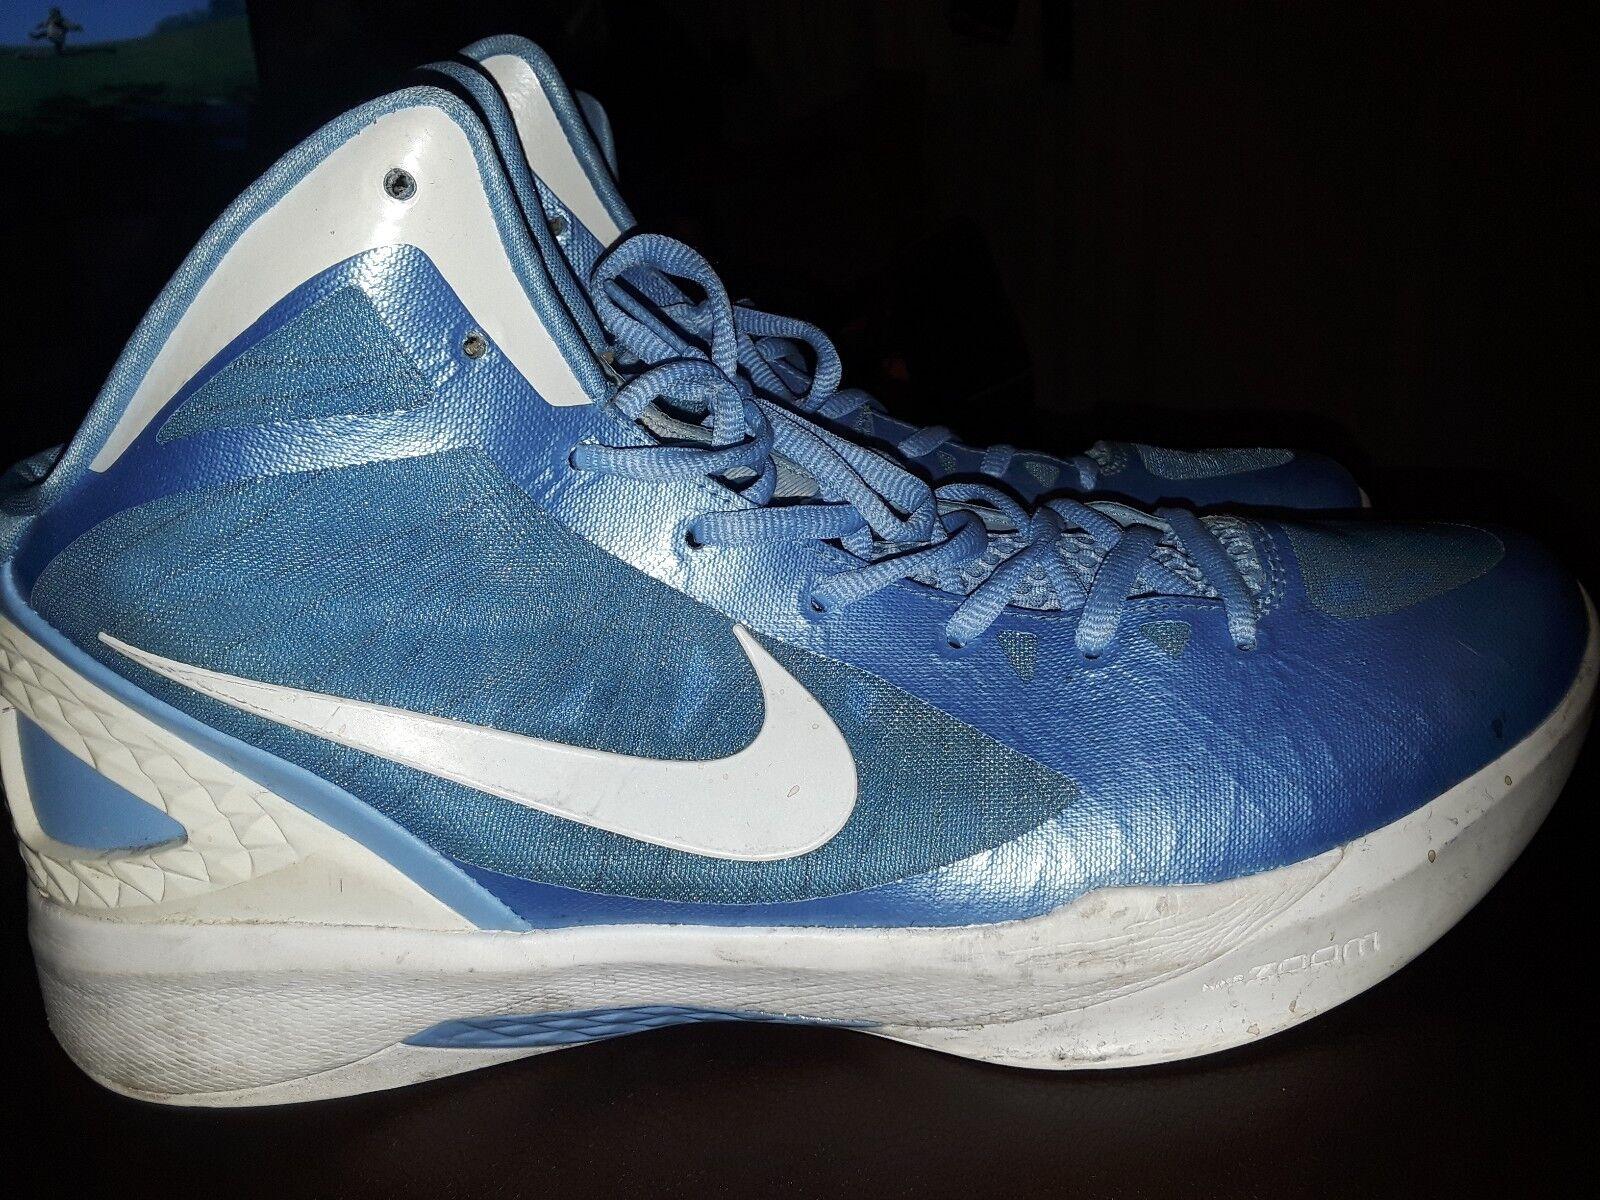 Nike 2011 hyperdunk zoom pallacanestro Uomo scarpe azzurre e bianche (raro